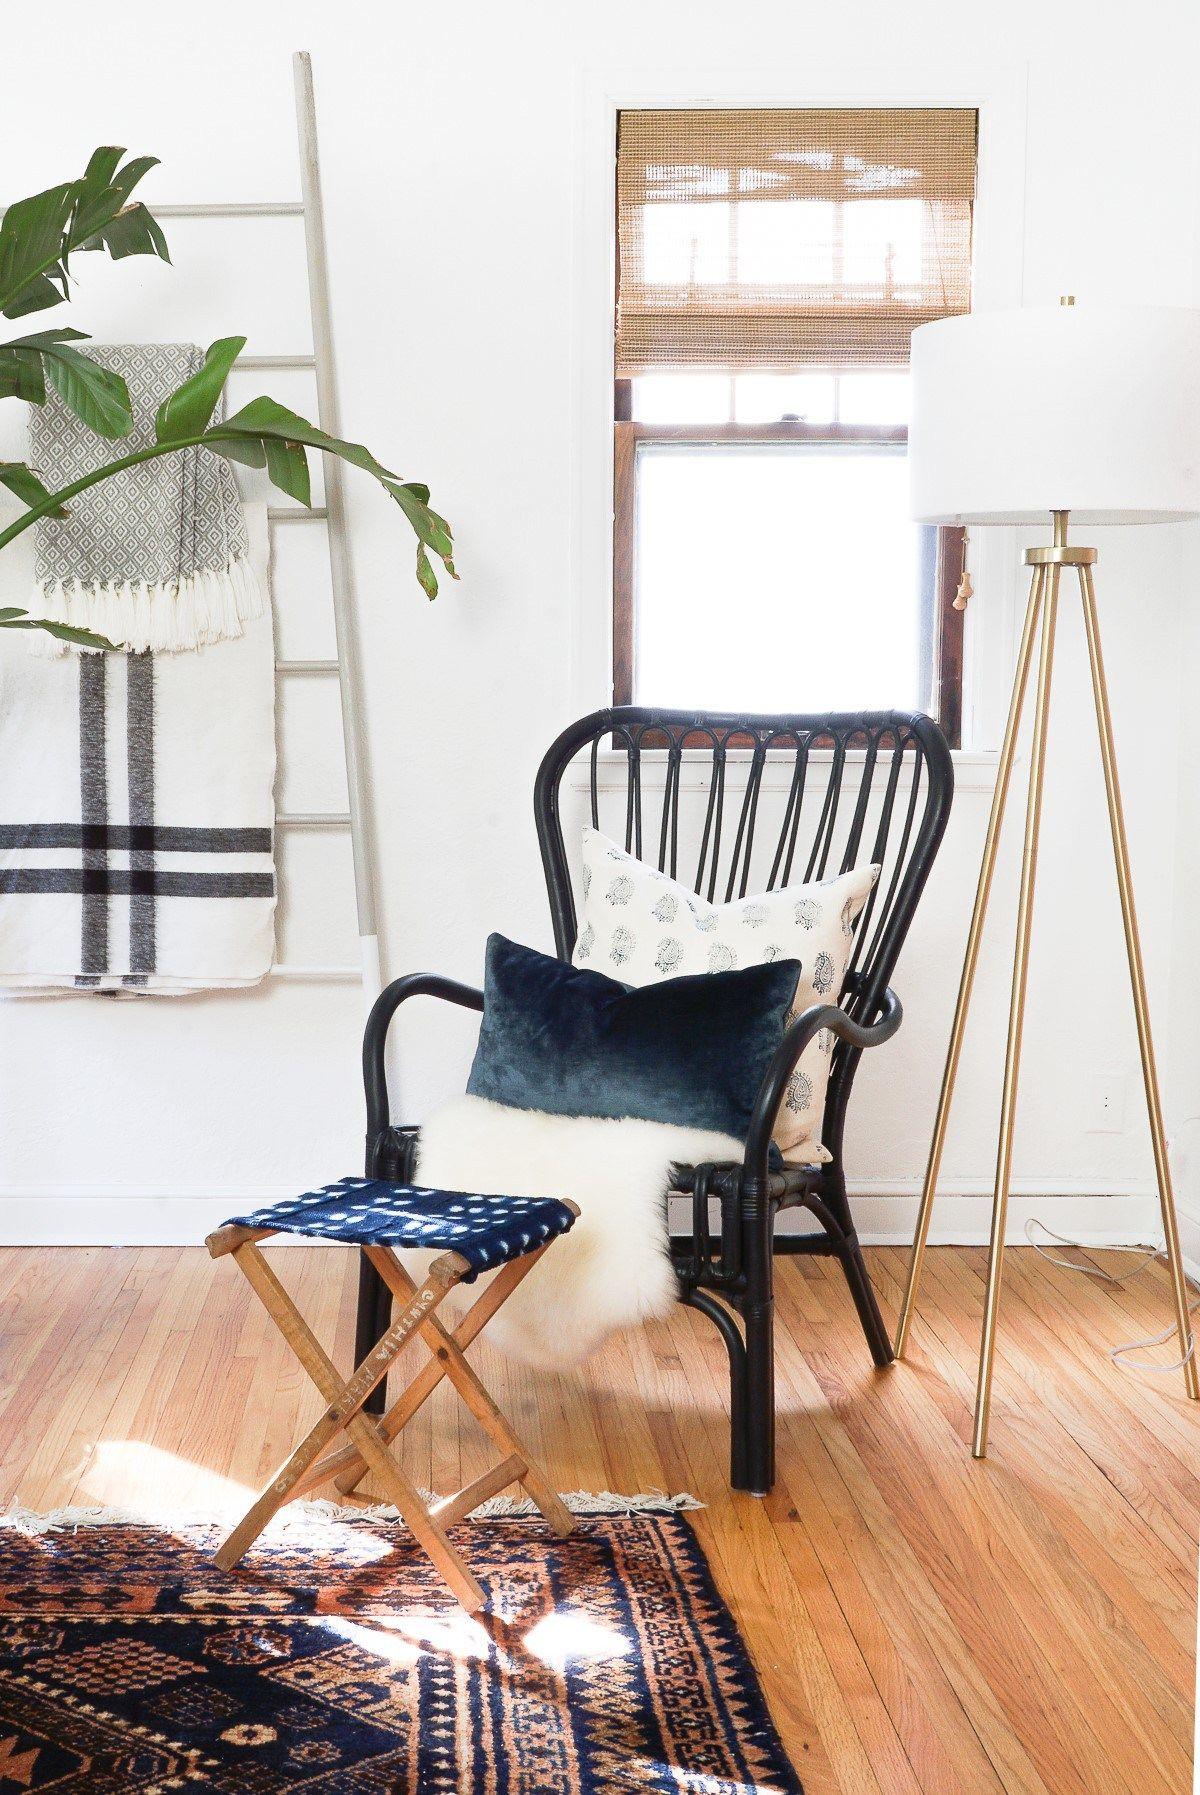 DIY Wood Dowel Blanket Ladder Home decor, Diy home decor